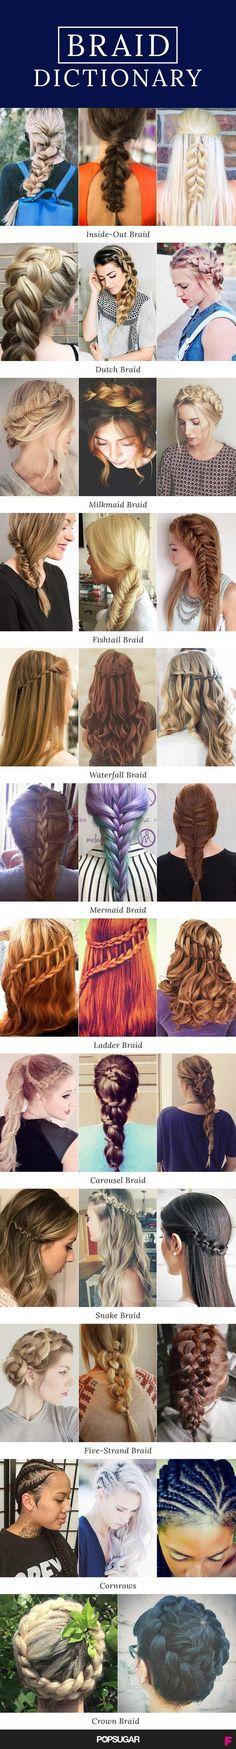 Braid Dictionary / #fashion #hairstyles